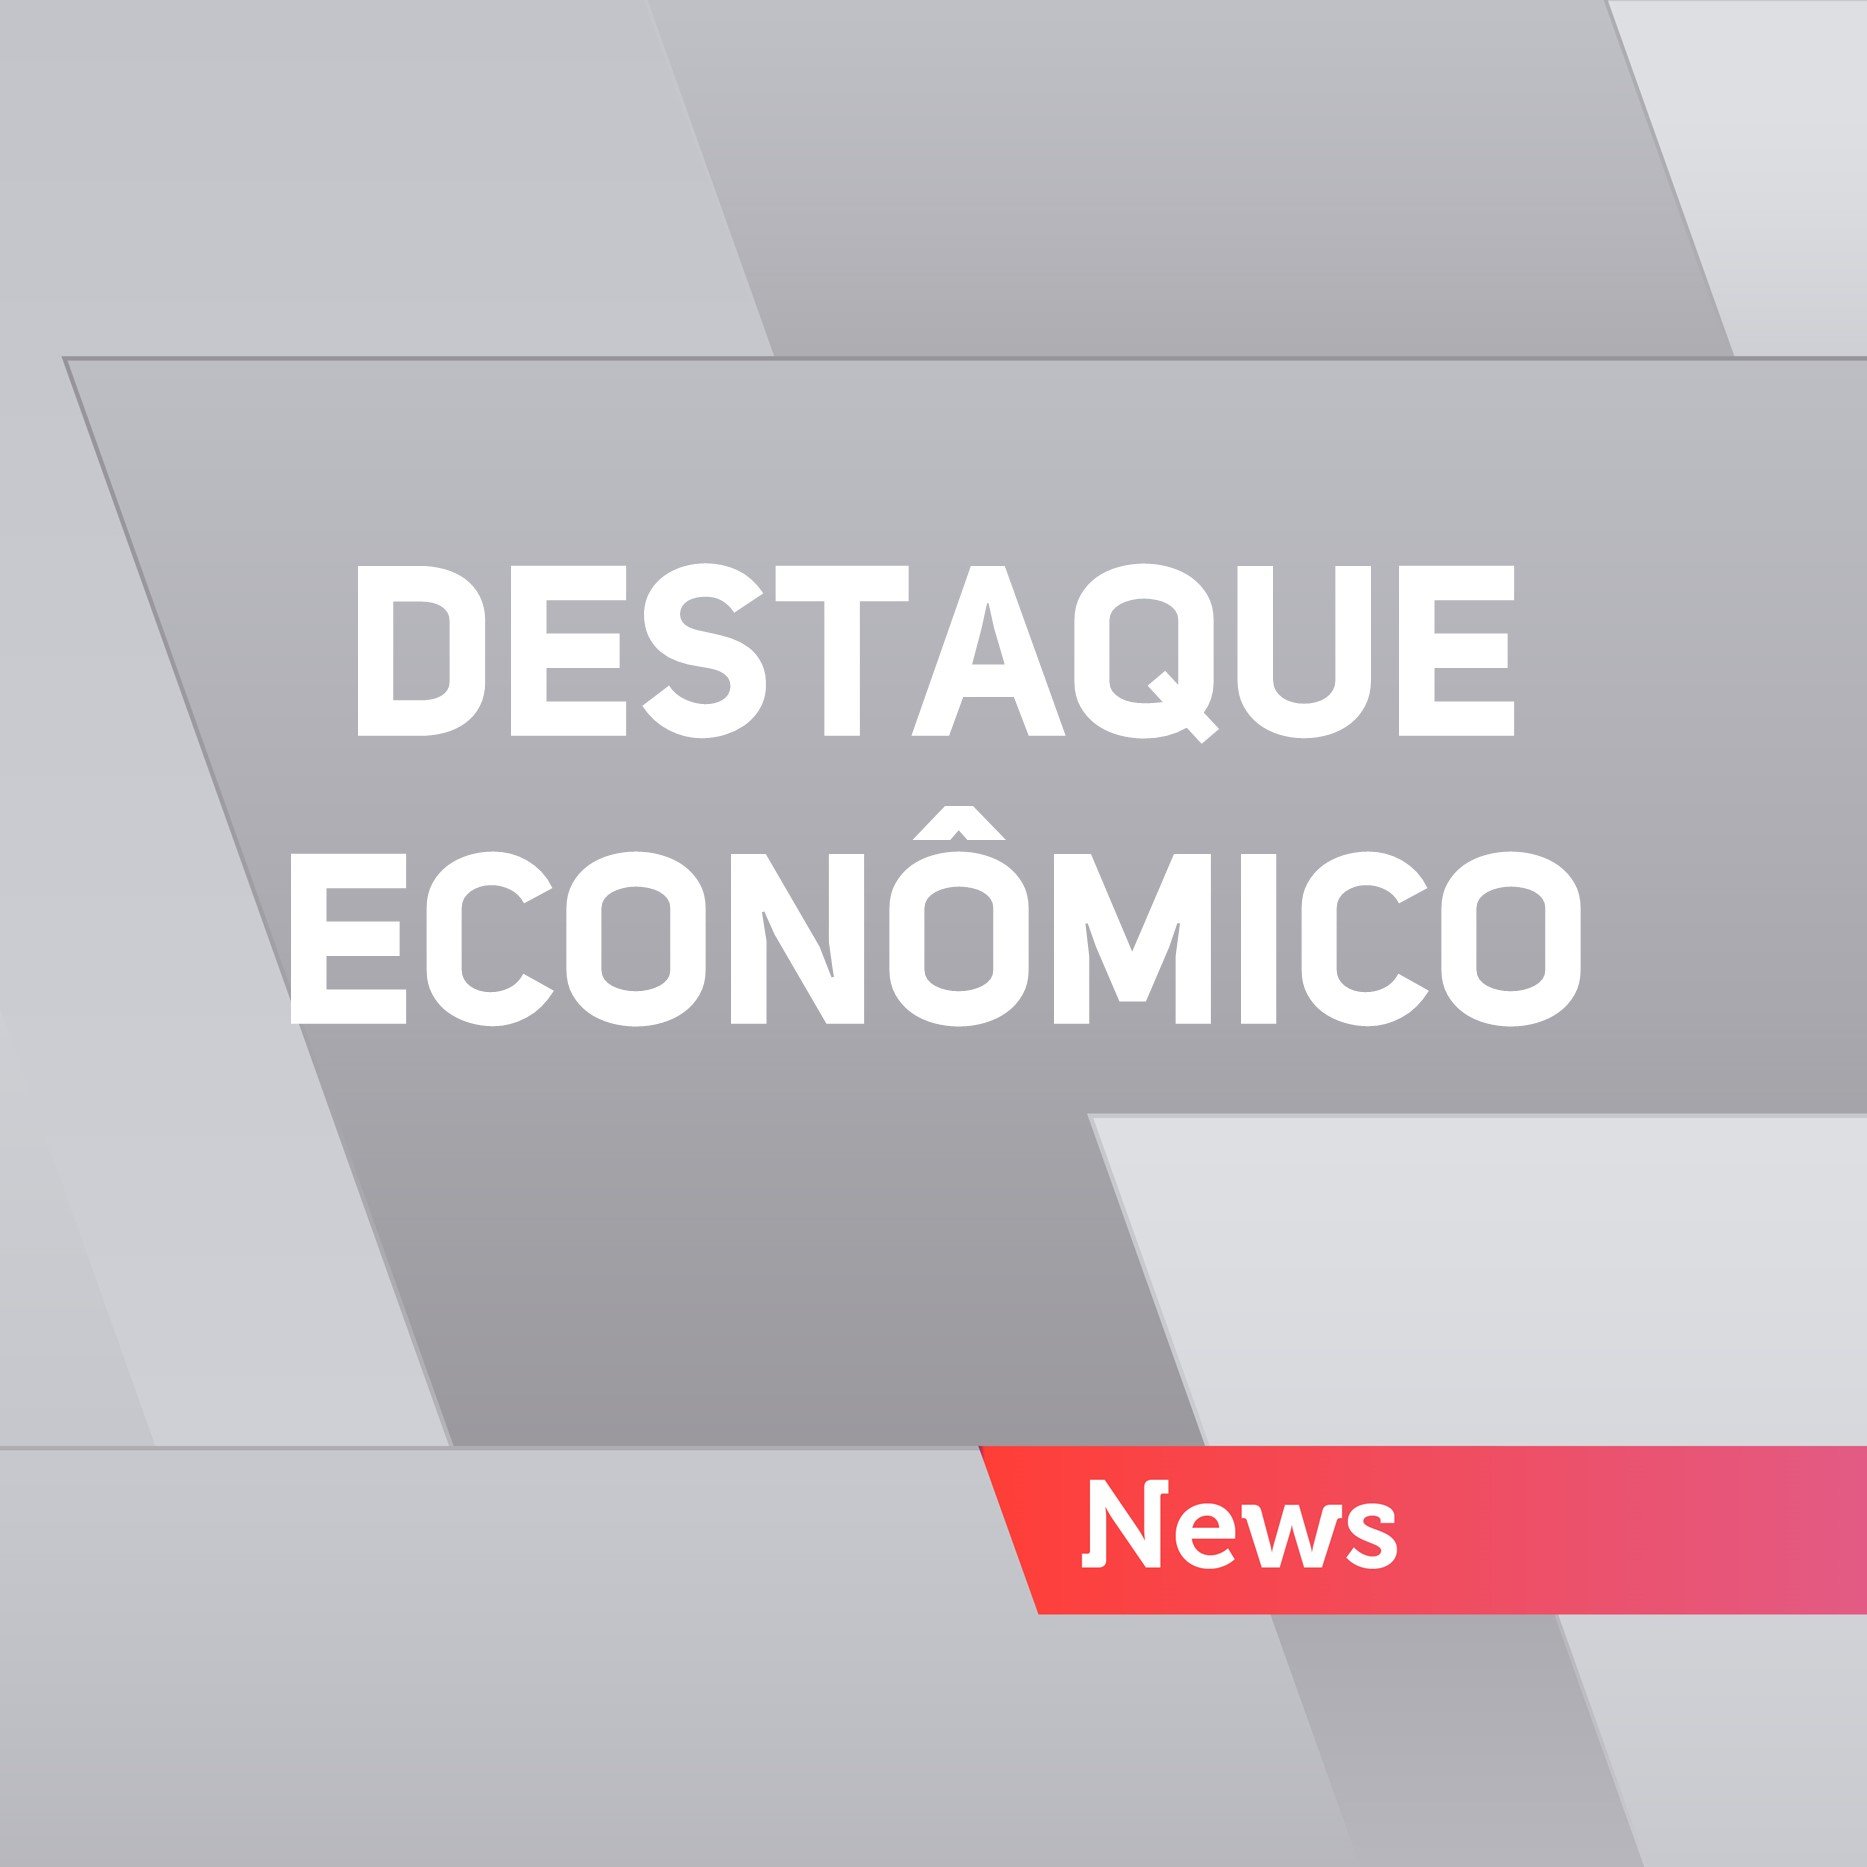 Destaque Econômico - 25/06/2017